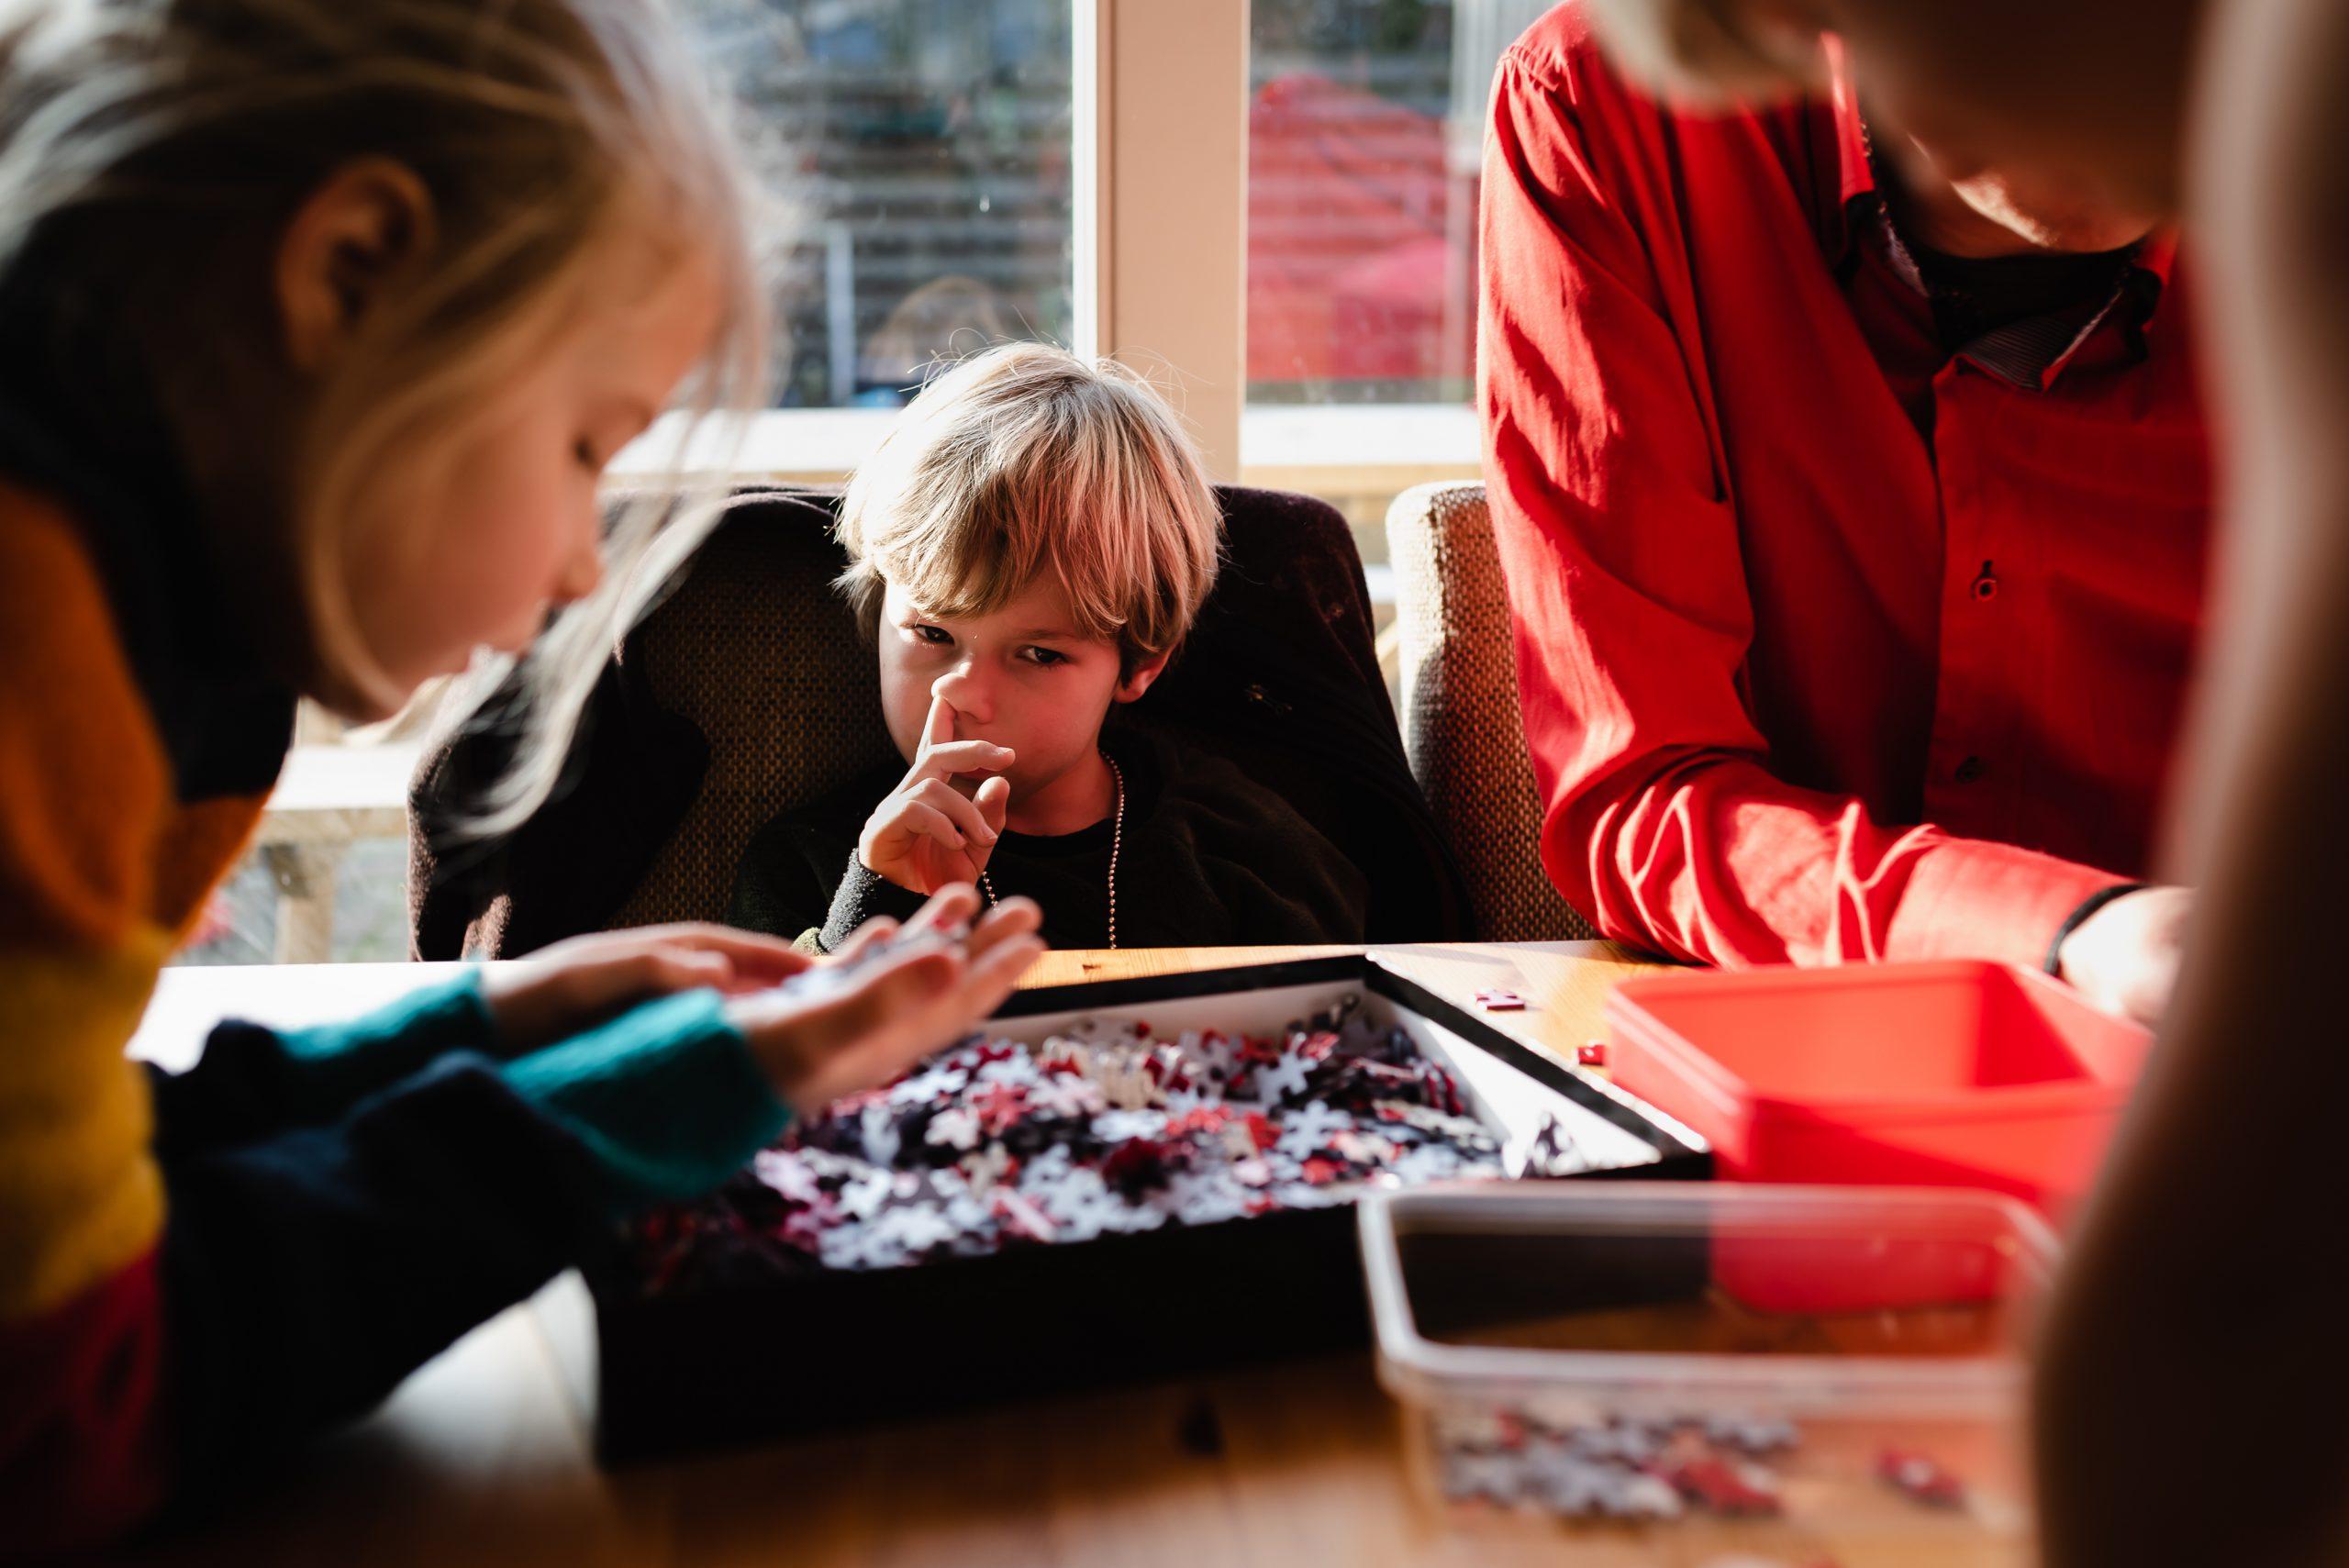 gezinsfotografie, familiefotograaf, Assen, fotograaf Drenthe, familiefotograaf Assen, gezinsfotograaf Drenthe, kind neuspeuteren, samen puzzel maken